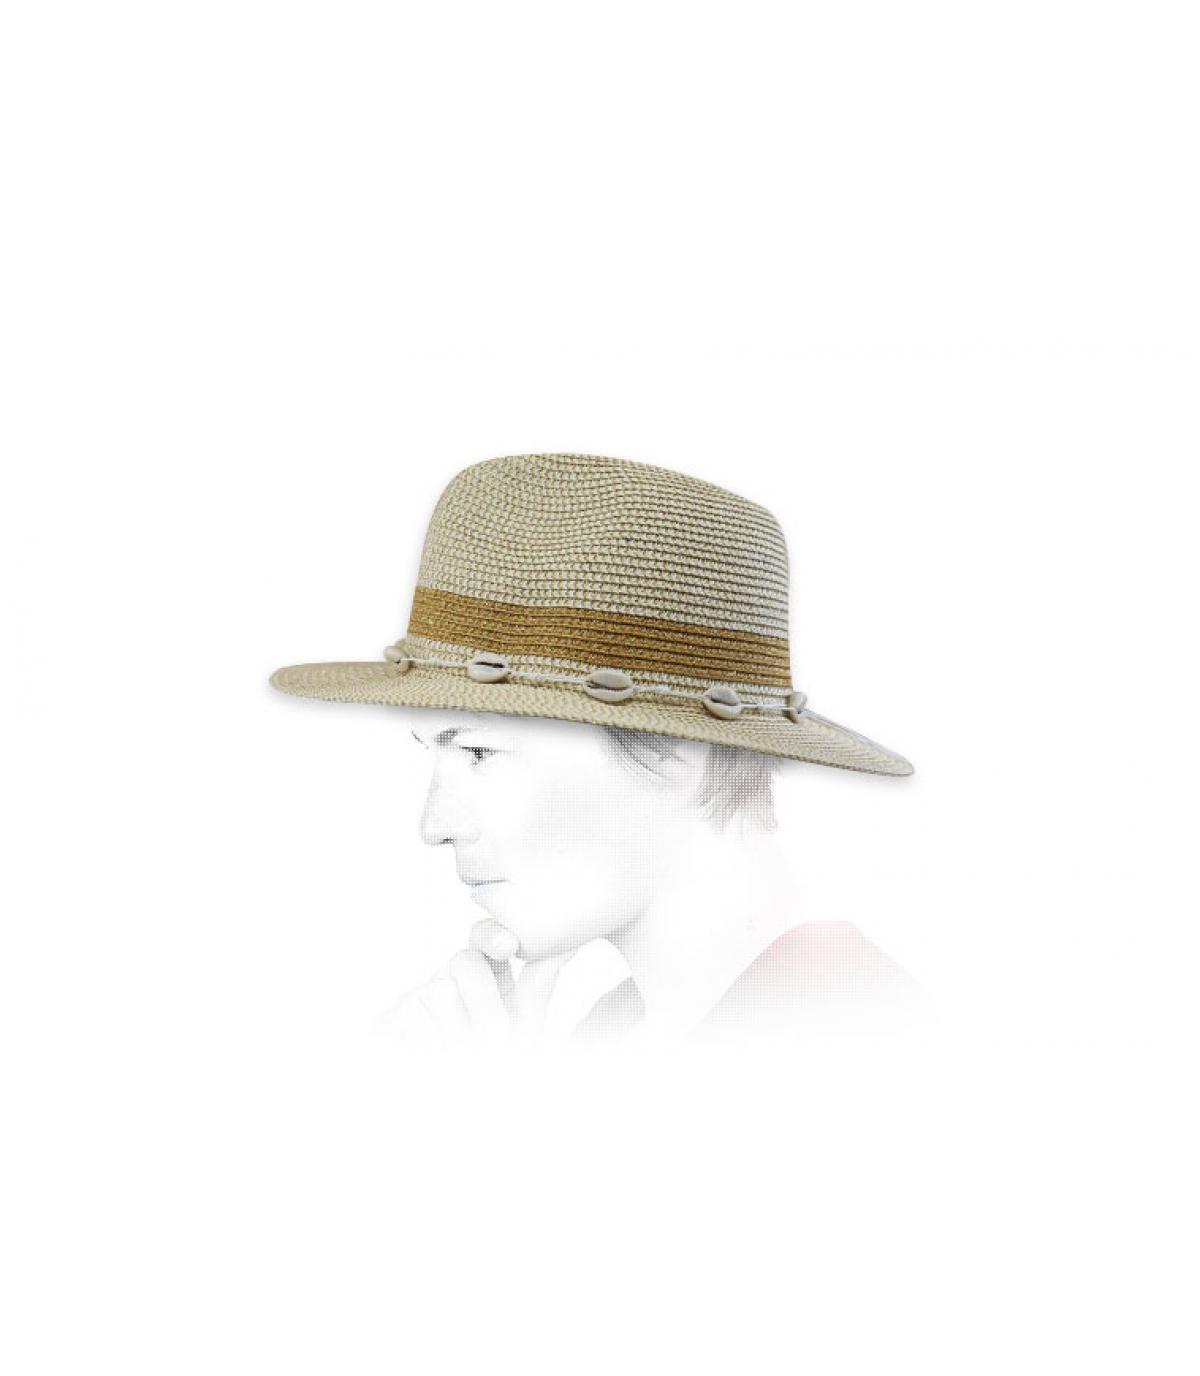 sombrero paja oro conchas